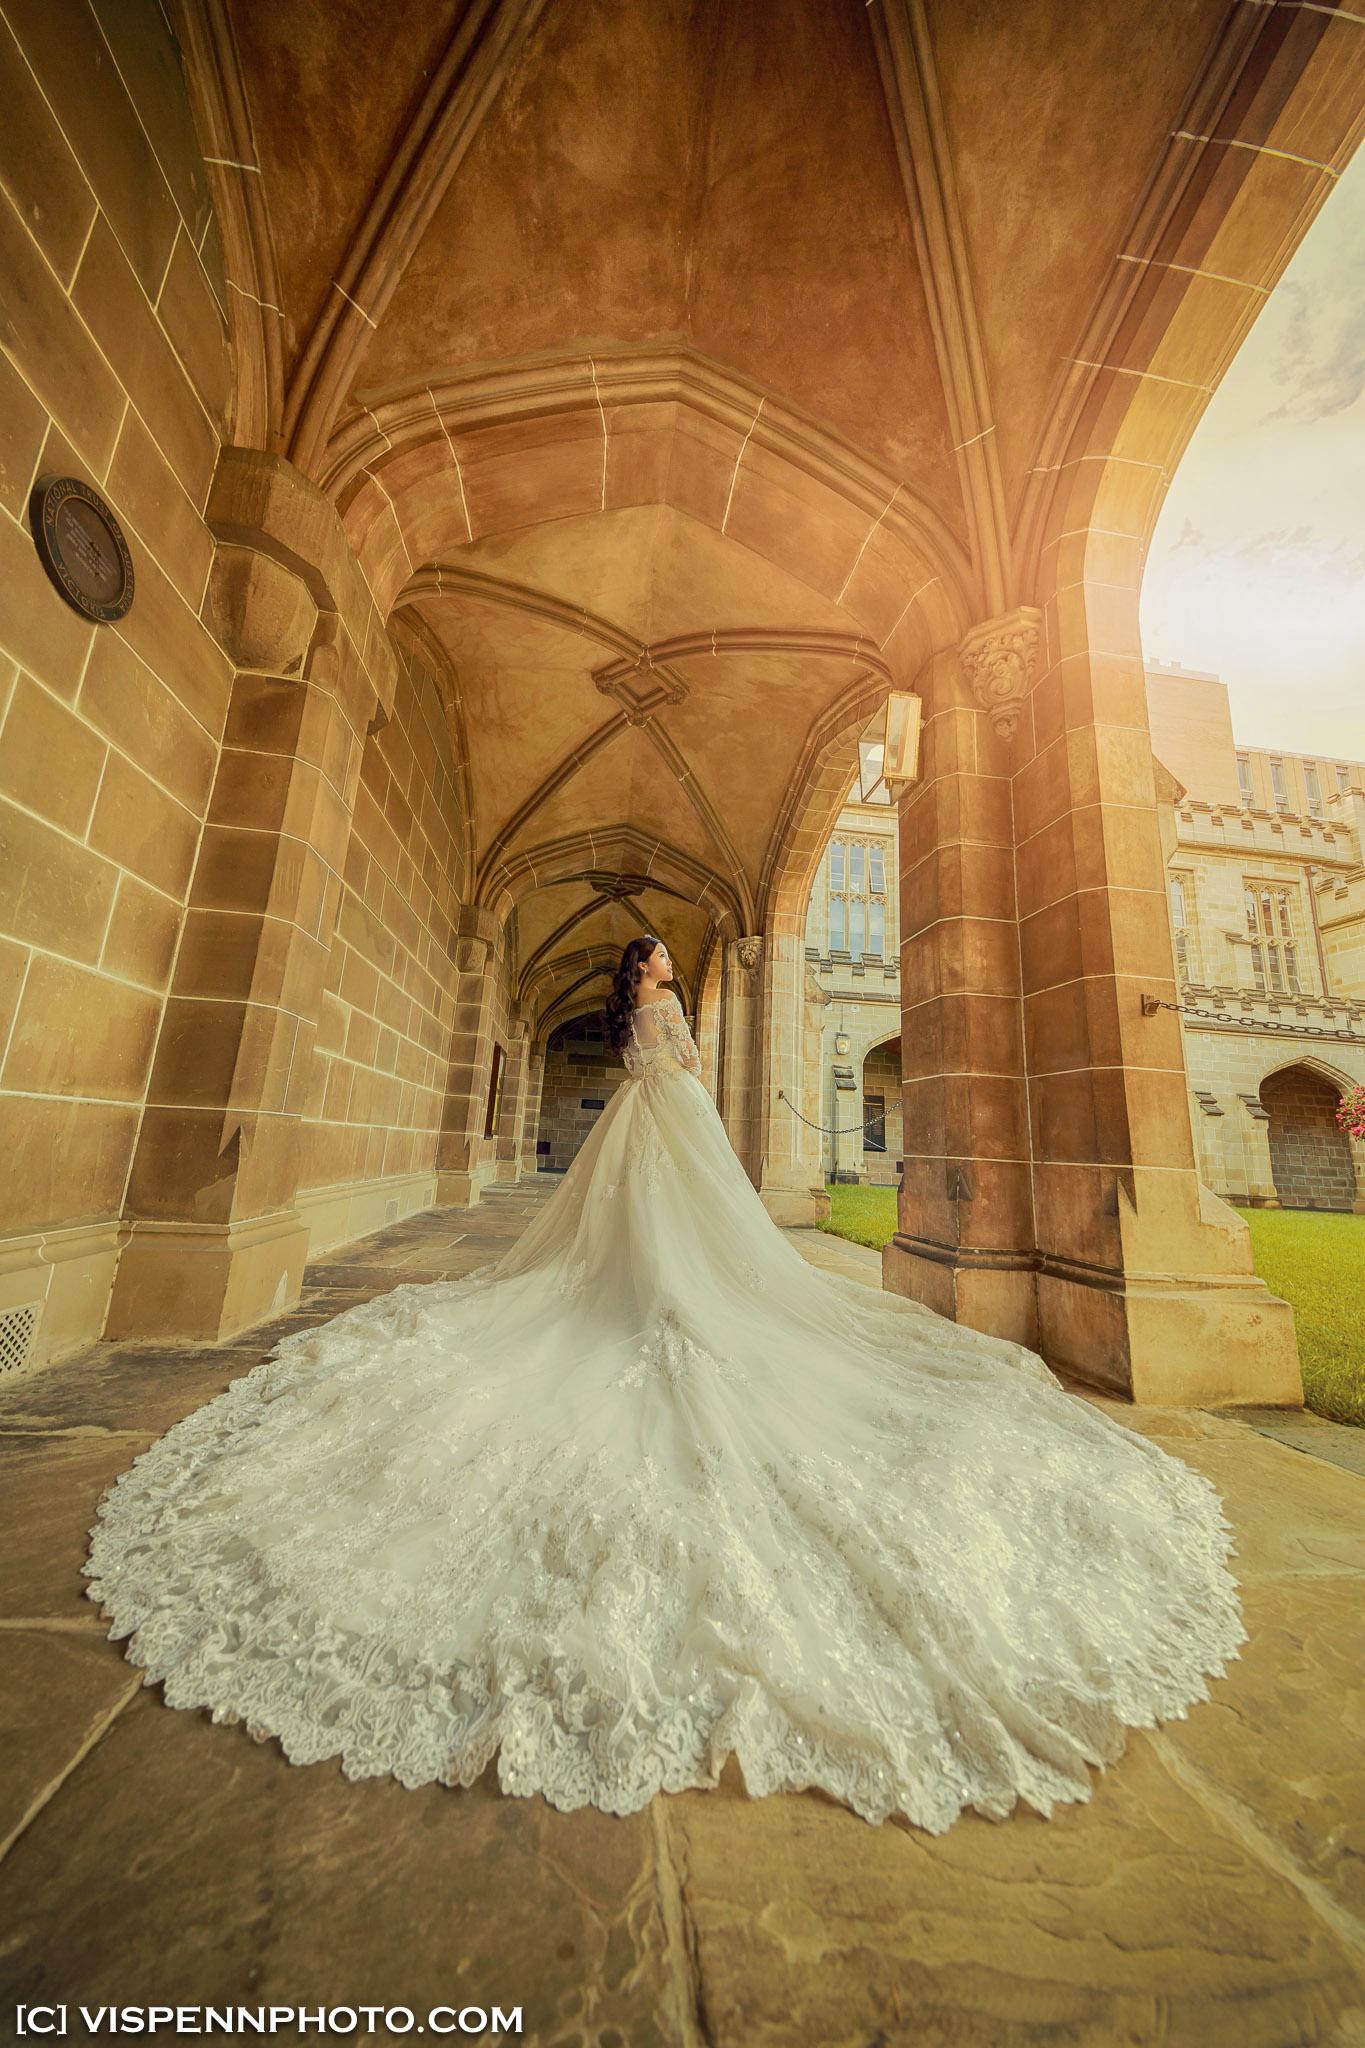 PRE WEDDING Photography Melbourne VISPENN 墨尔本 婚纱照 结婚照 婚纱摄影 VISPENN JackySerena 0502 1